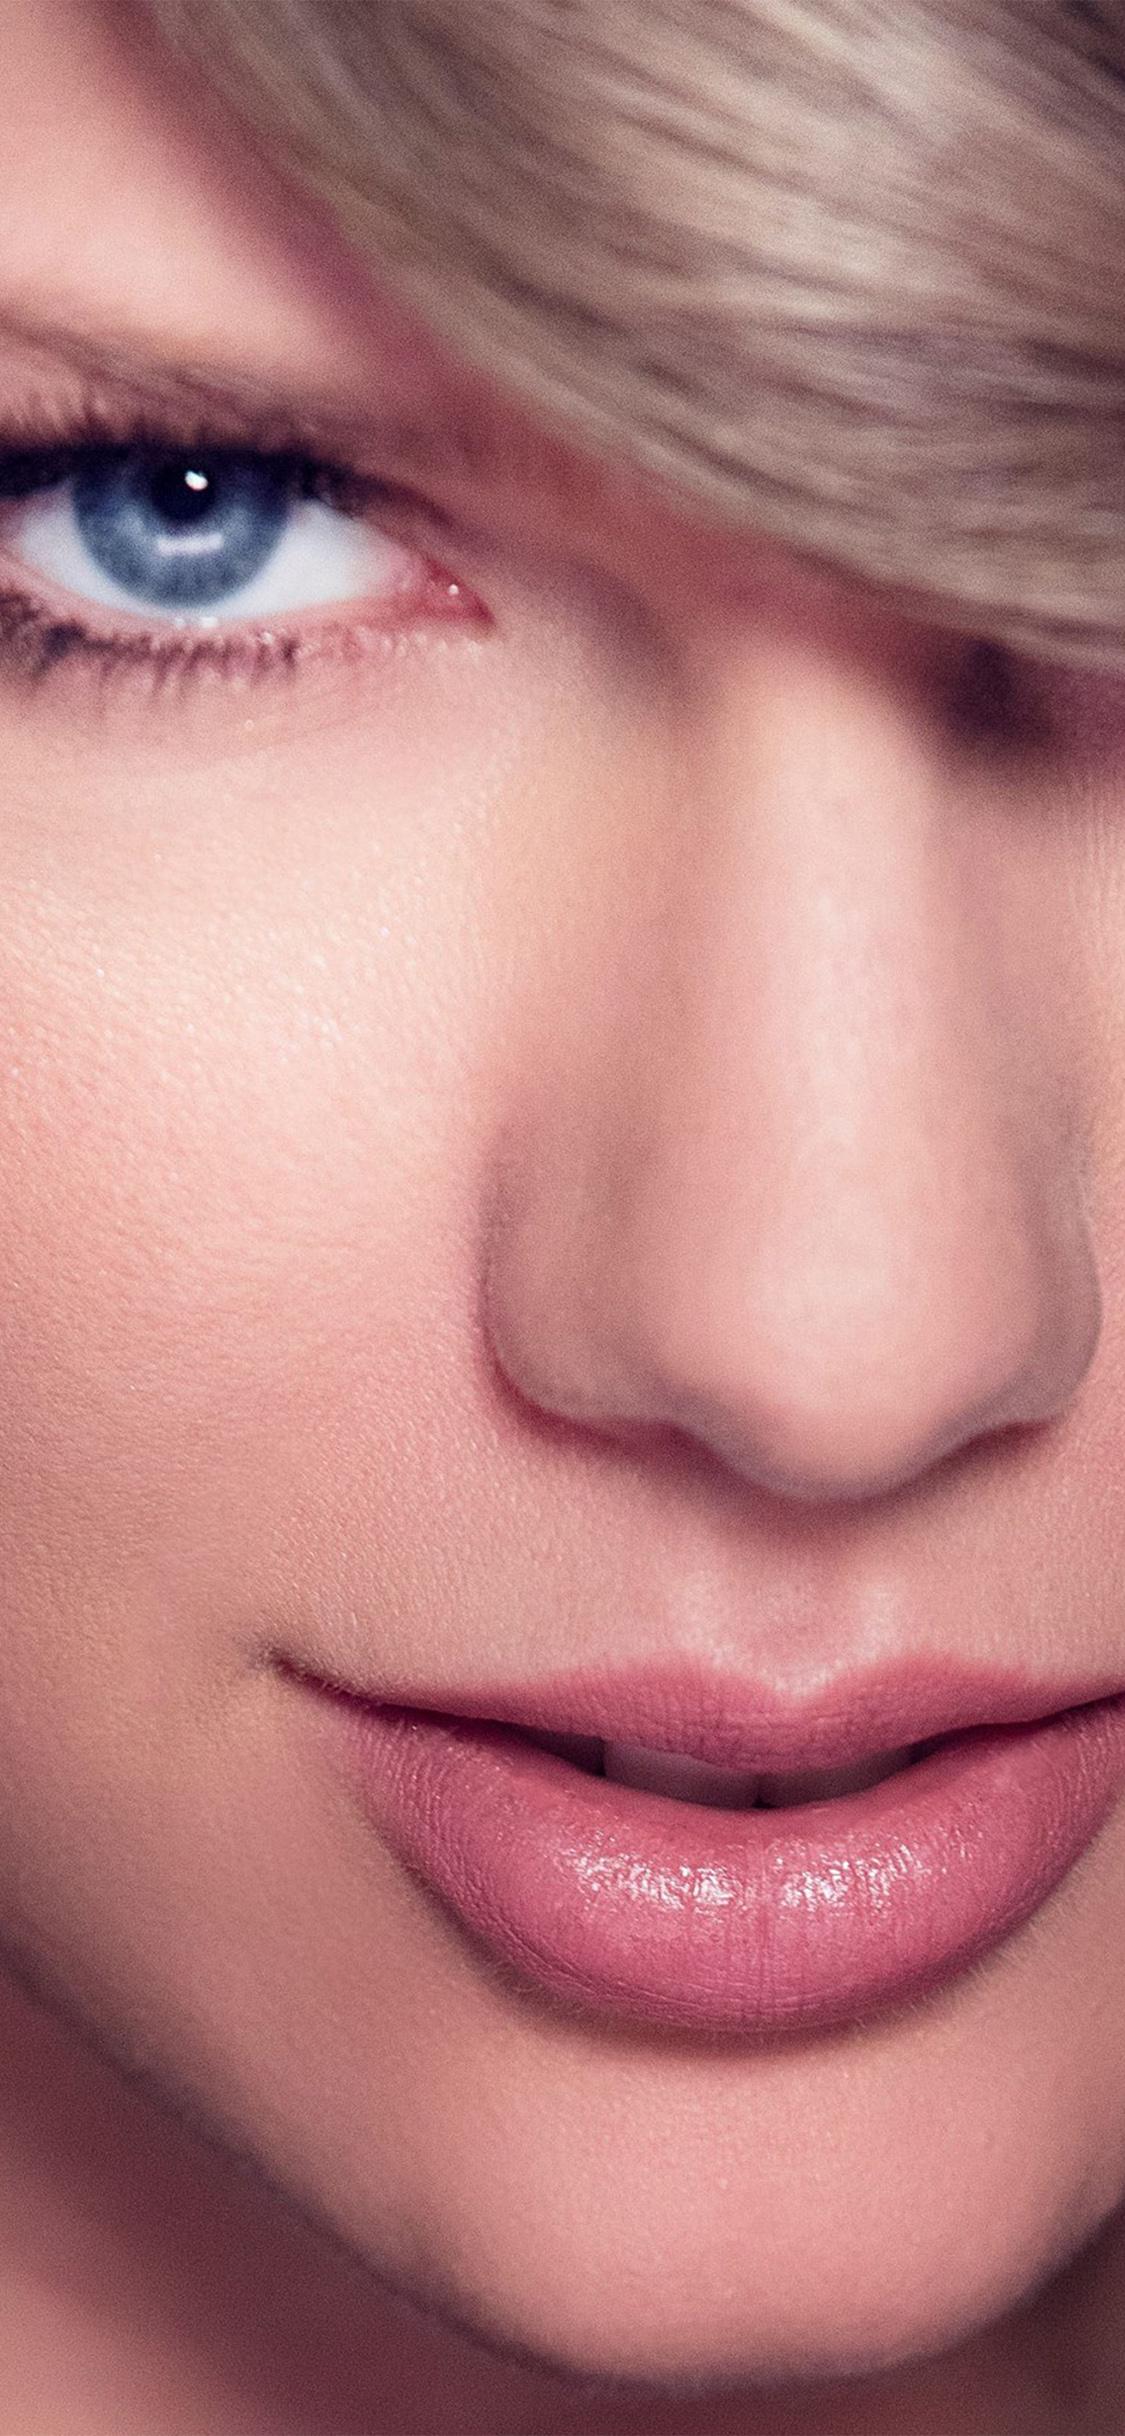 iPhoneXpapers.com-Apple-iPhone-wallpaper-hm25-taylor-swift-face-singer-celebrity